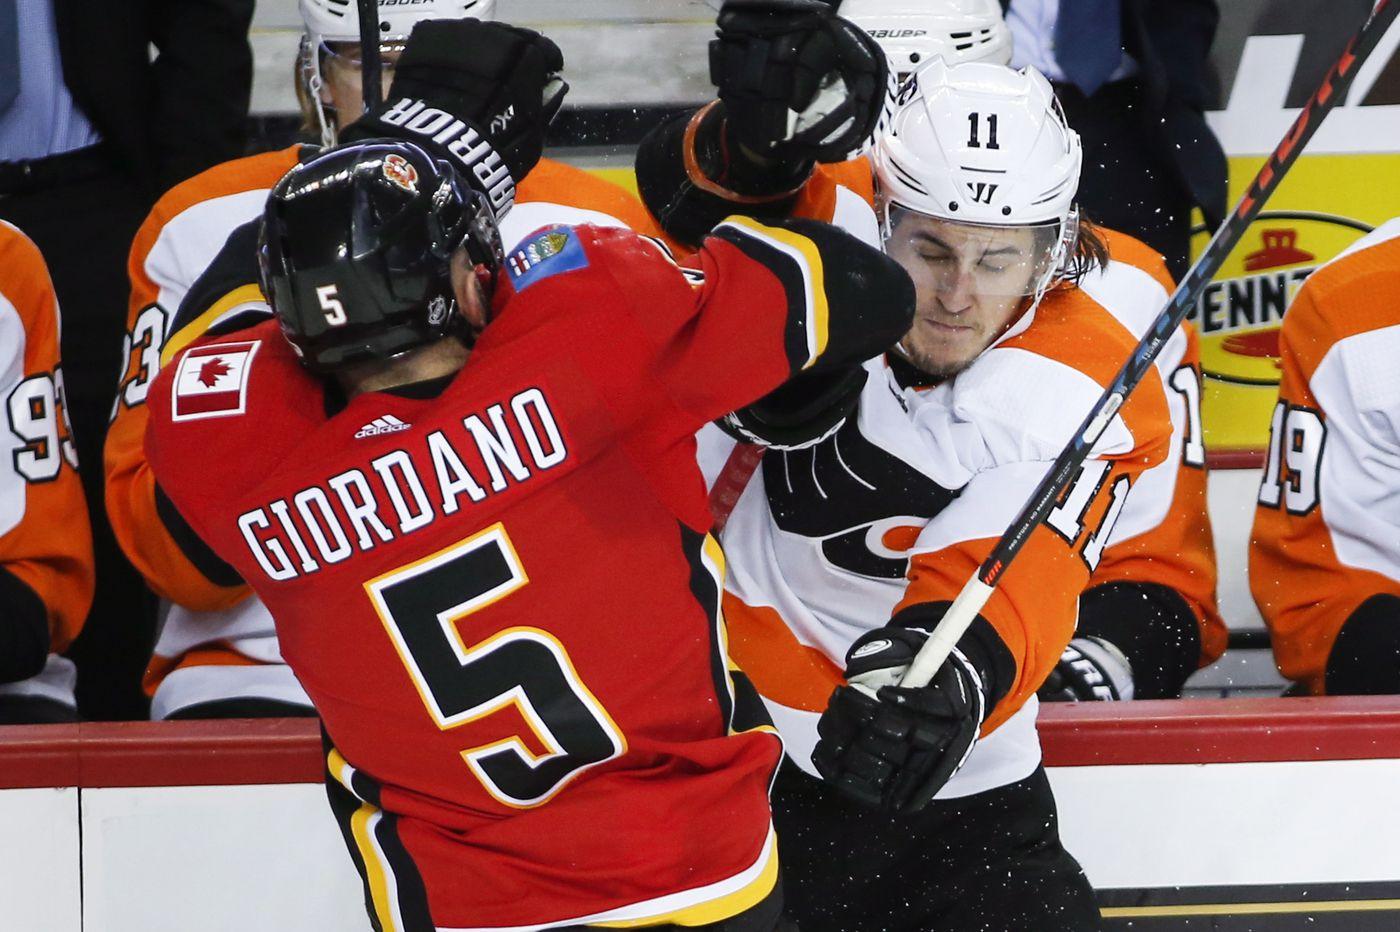 Three late Calgary goals stun Flyers, 6-5